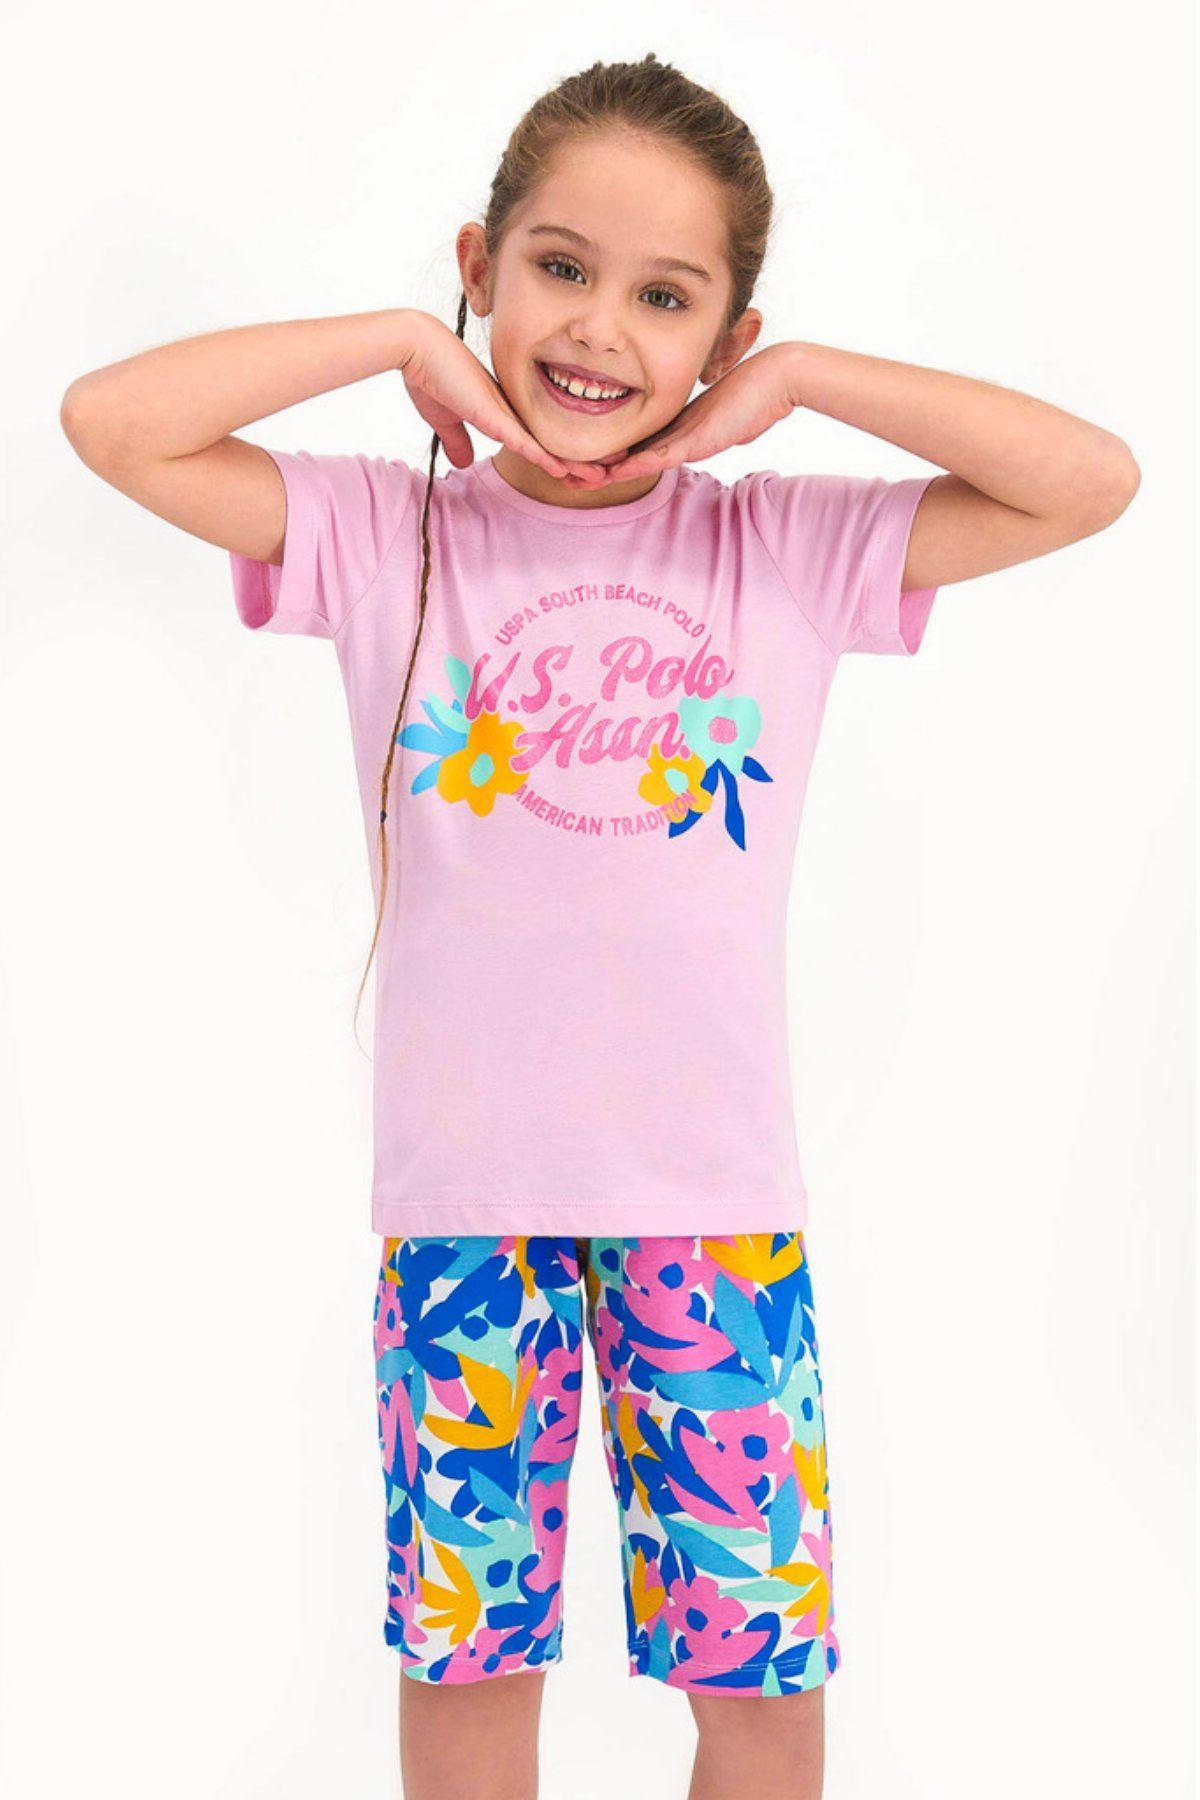 9-15 Yaş Us Polo ASSN Lisanslı South Beach Toz Pembe Kız Çocuk Takım